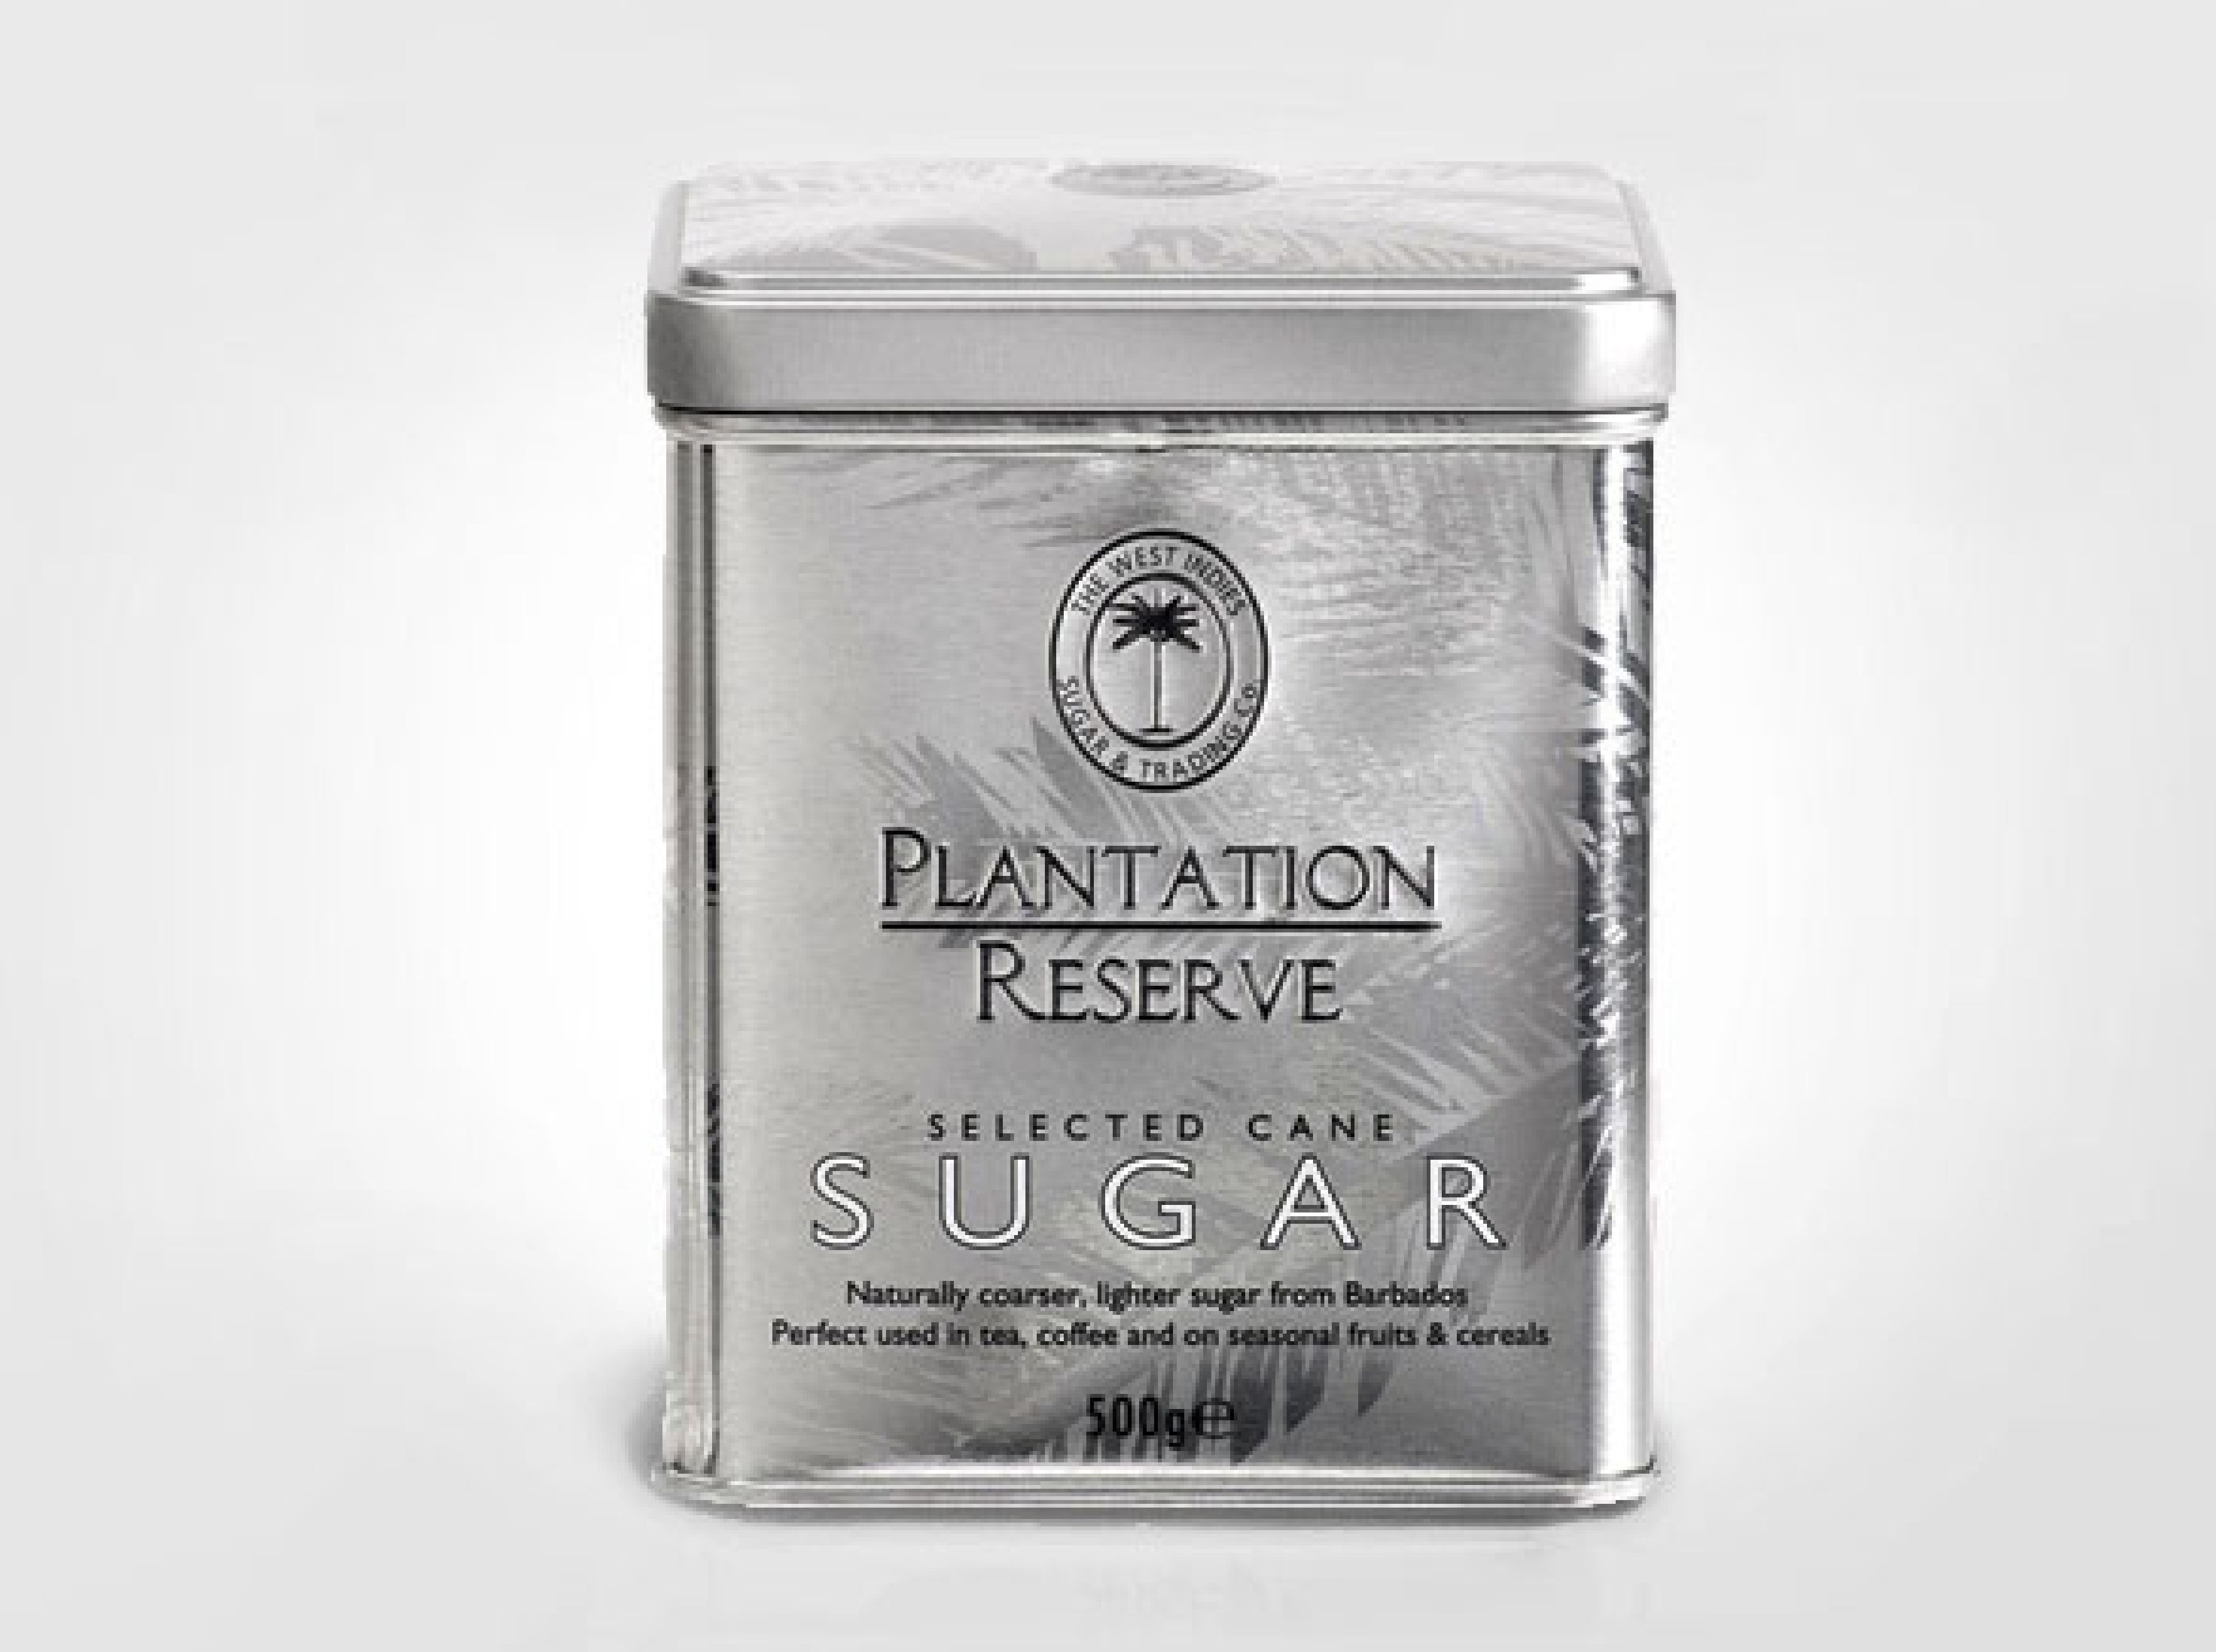 Plantation Reserve Sugar